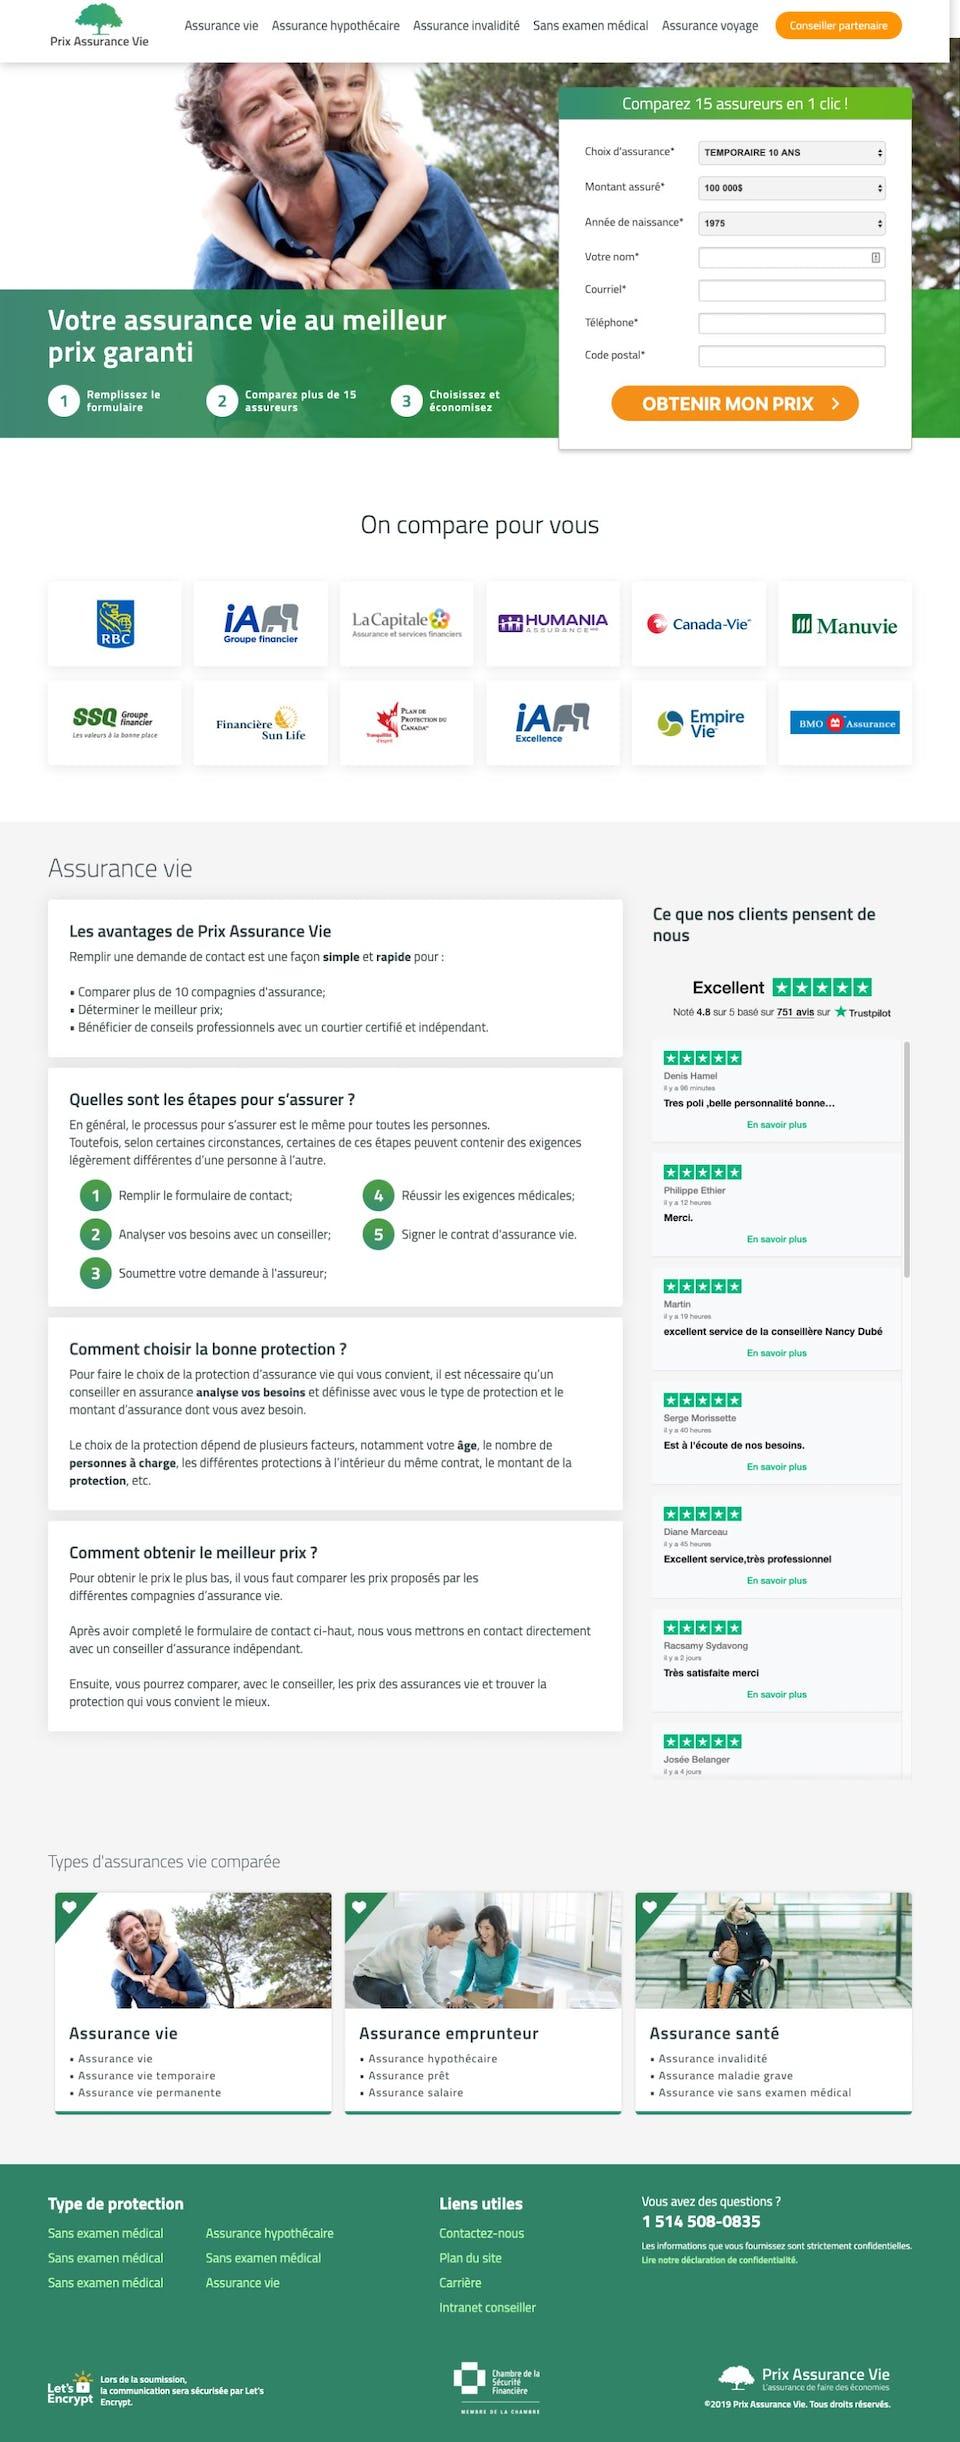 webflow project 2 - Prix Assurance Vie